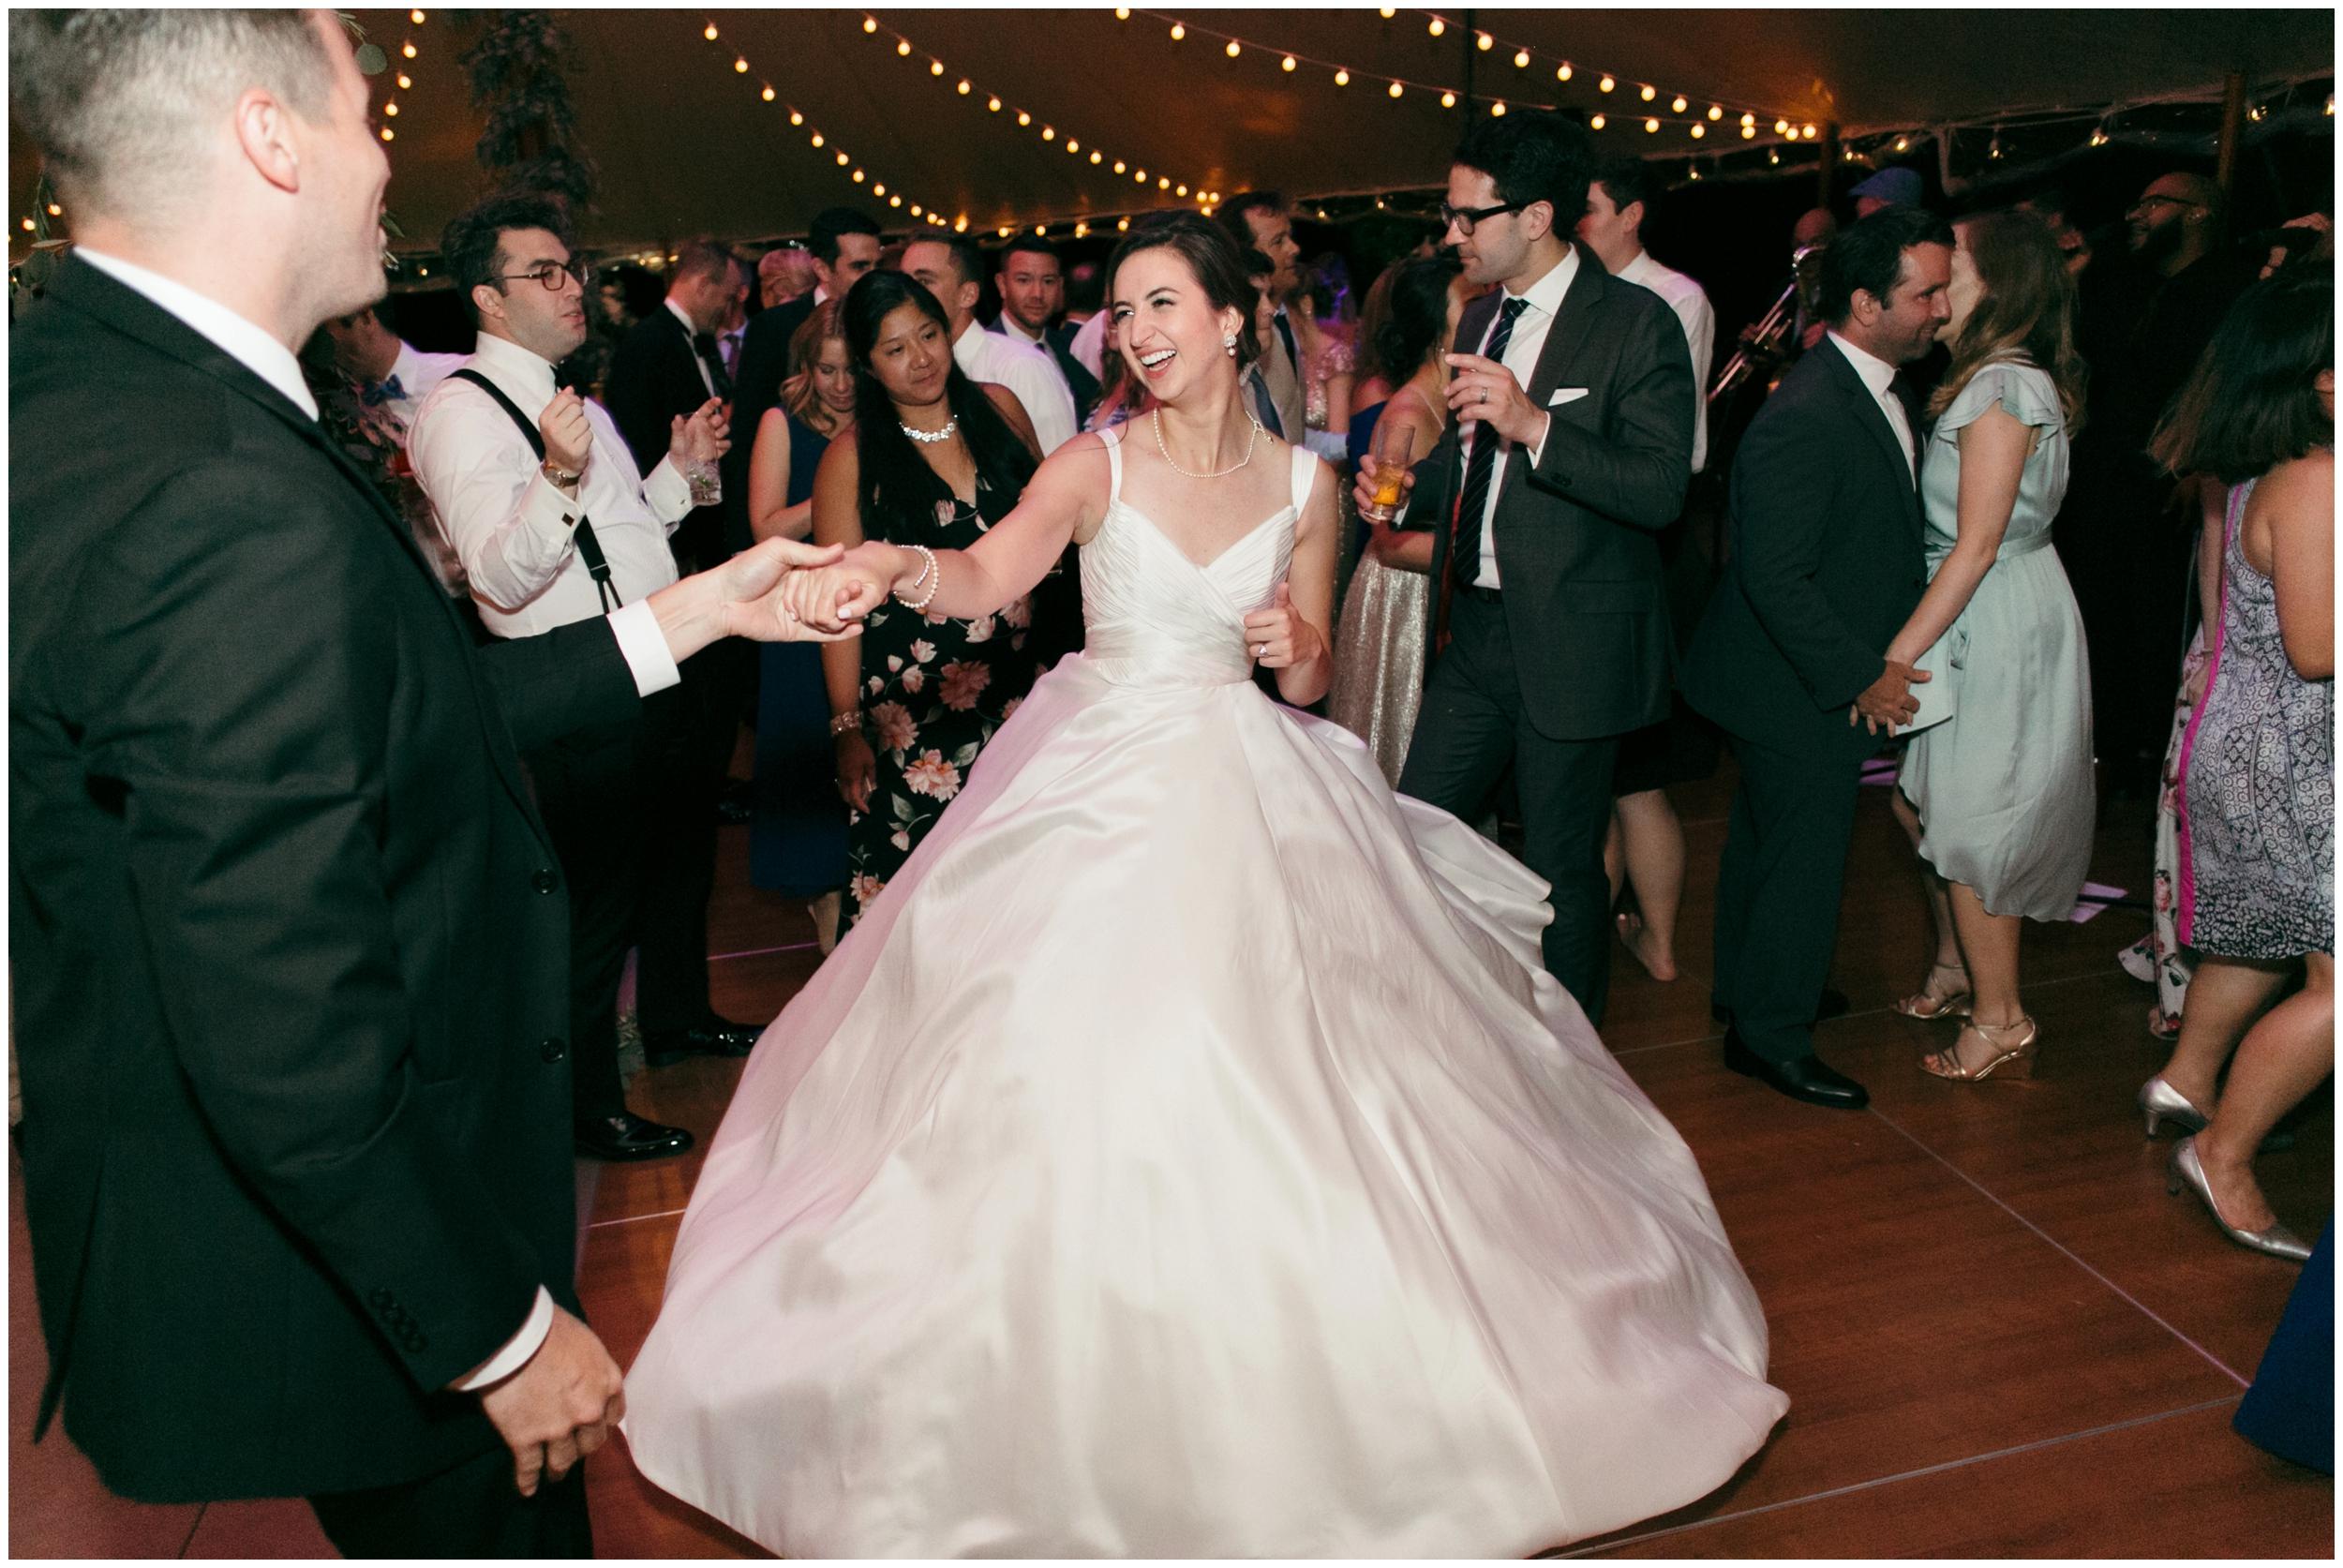 Willowdale-Estate-Wedding-Bailey-Q-Photo-Boston-Wedding-Photographer-114.JPG